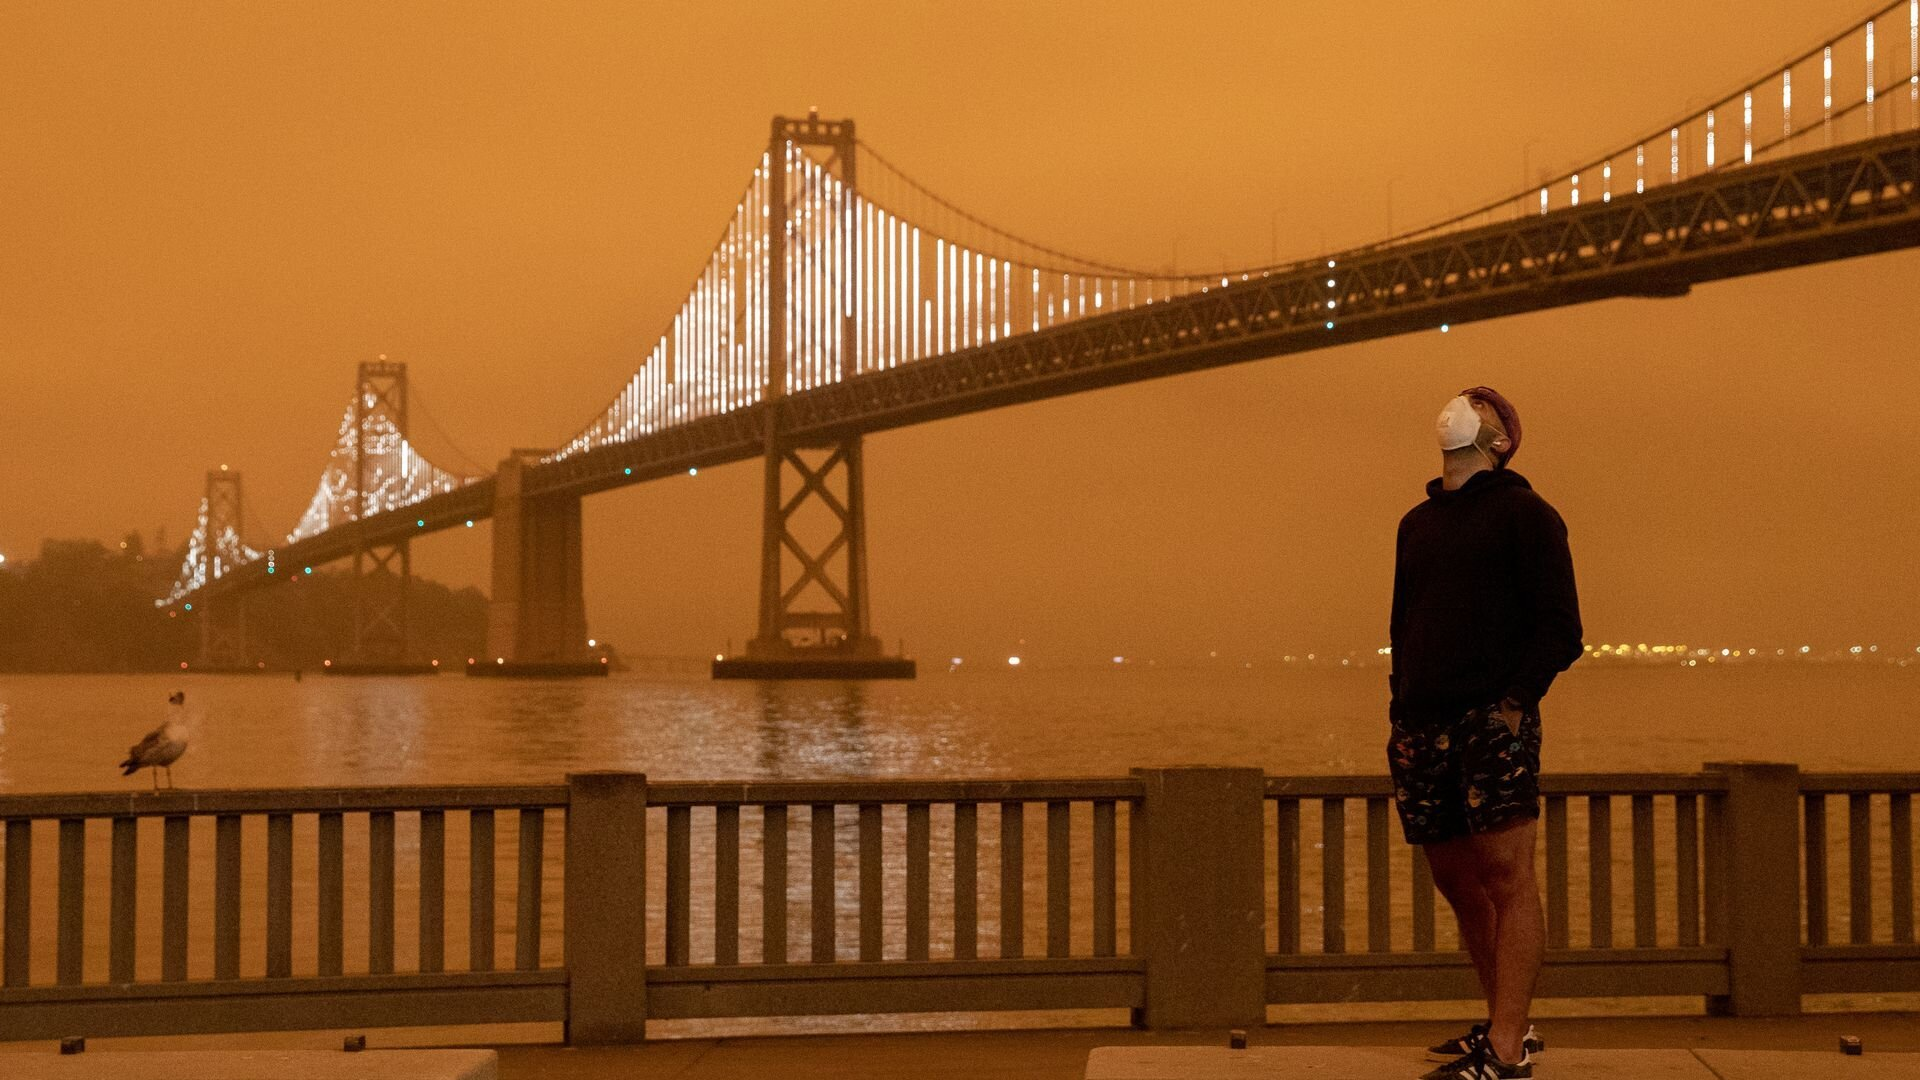 Incendi e nubi di fumo in america